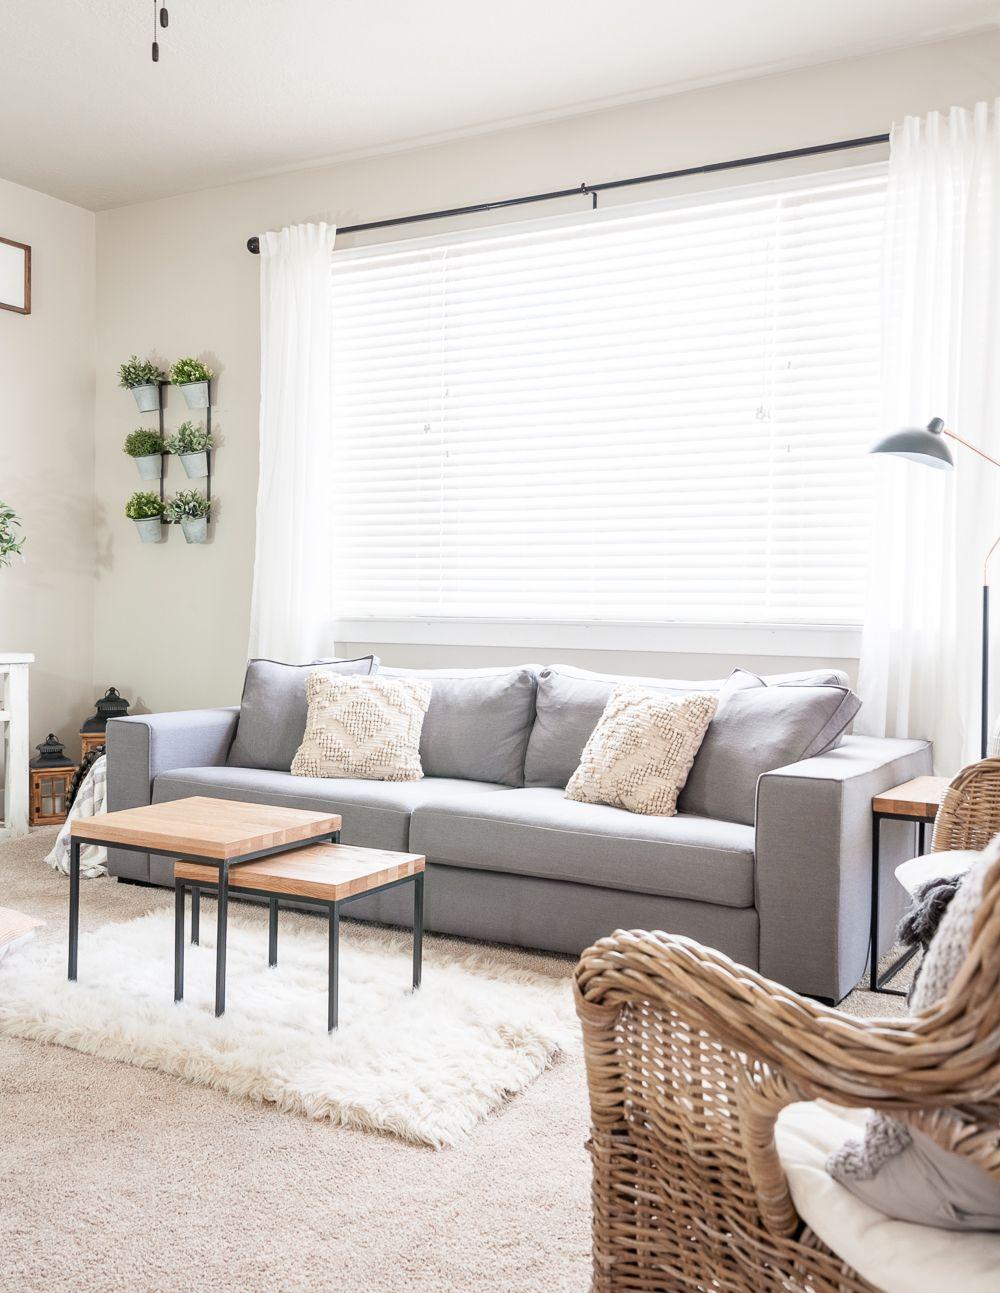 Minimalist Living Room Decor Makeover Cherished Bliss Vintage Living Room Decor Home Living Room Minimalist Living Room Decor